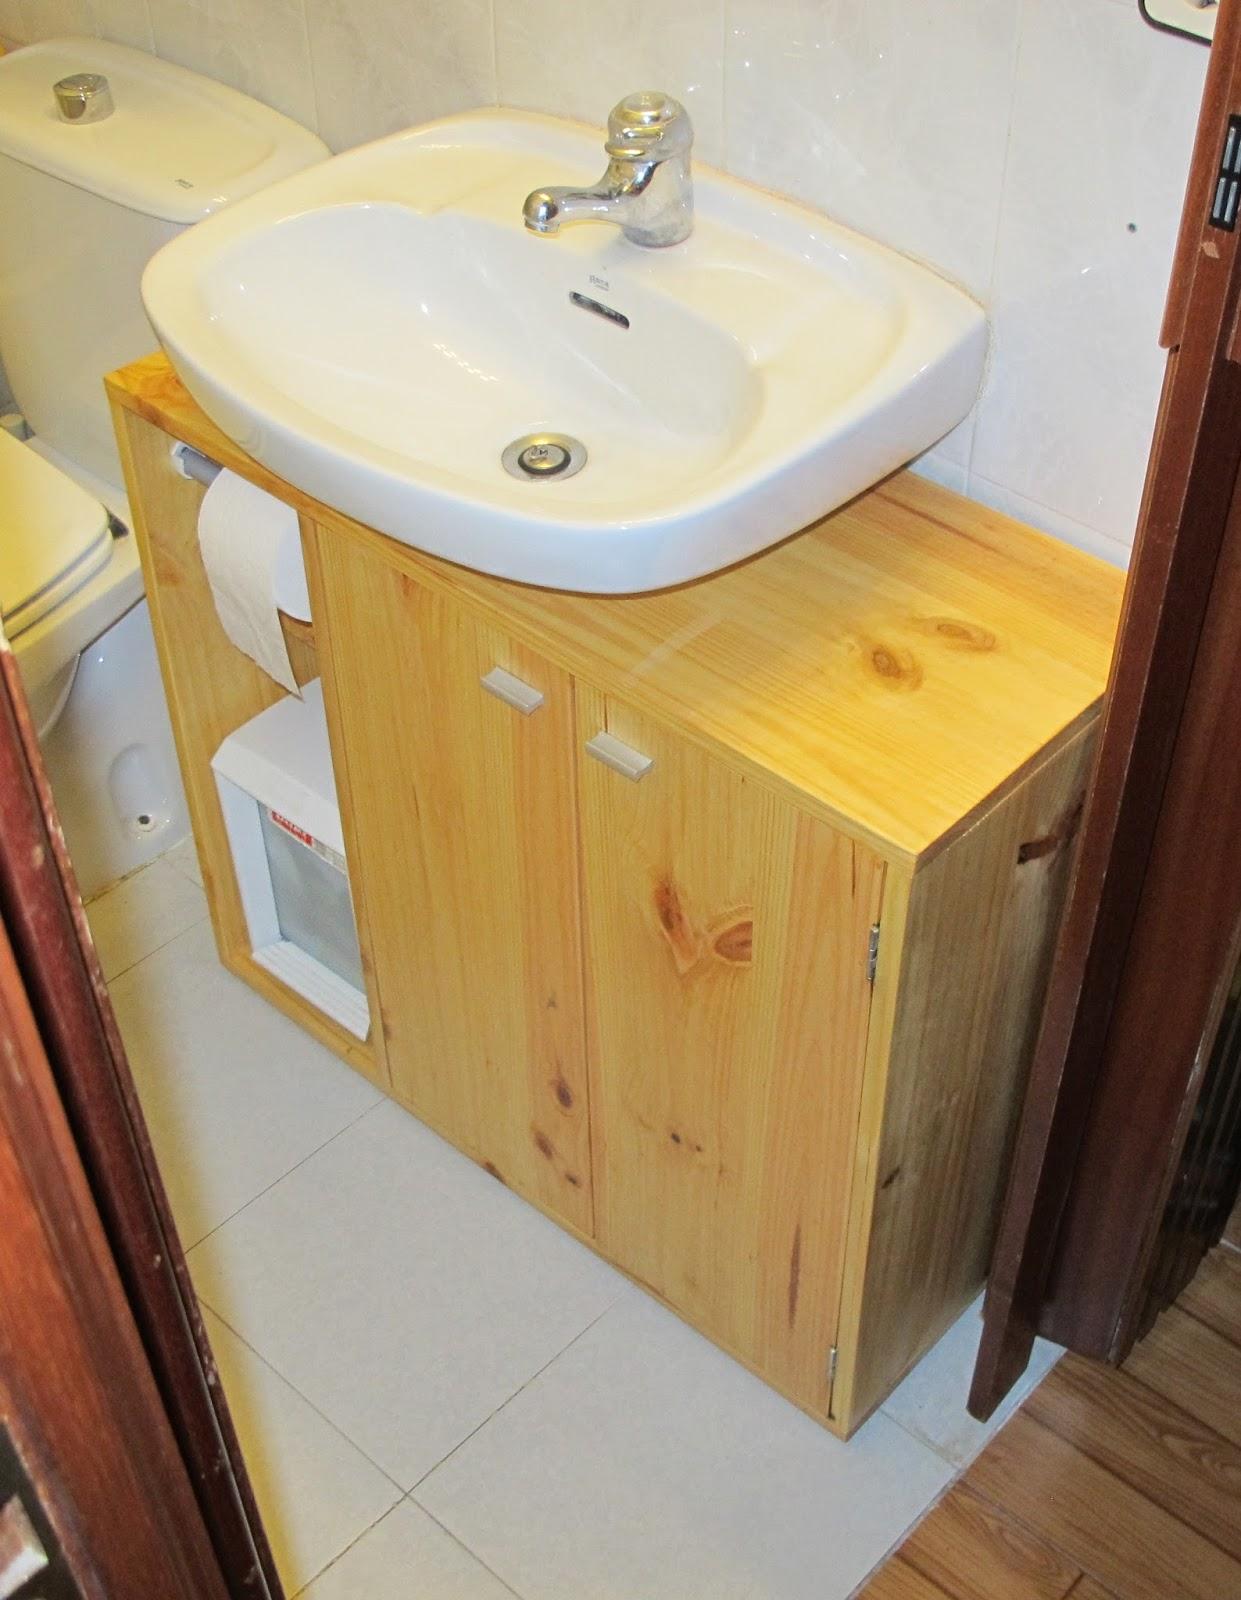 Bricomonxo mueble bajo lavabo de madera for Bajo lavabo de obra